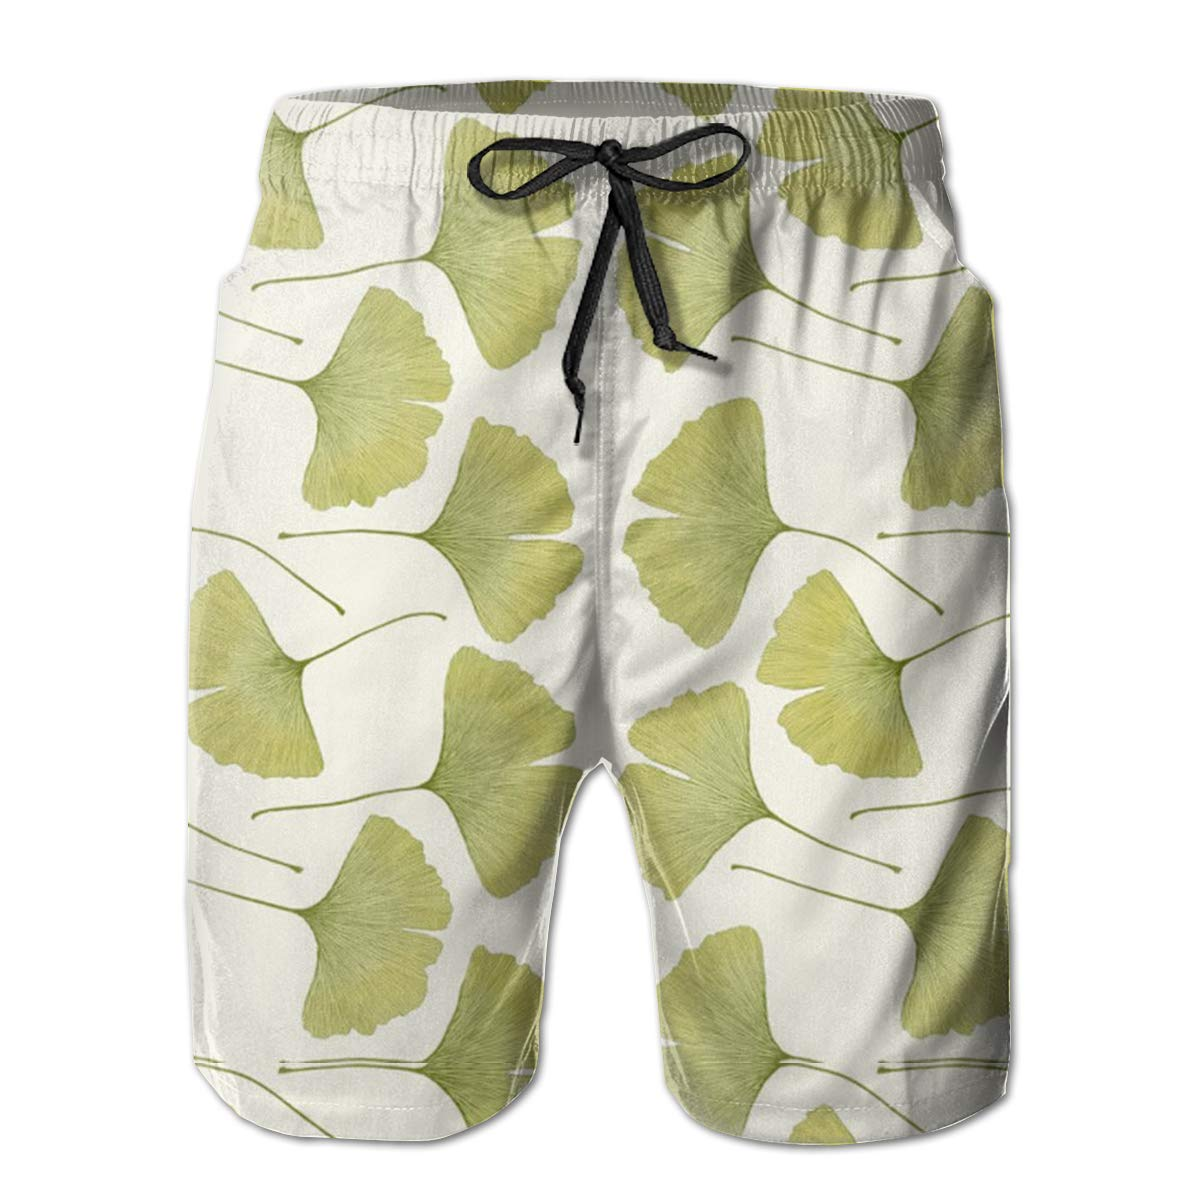 WMDJEG Green Ginko Leaves Mens Summer Beachwear Sports Running Swim Board Shorts Mesh Lining